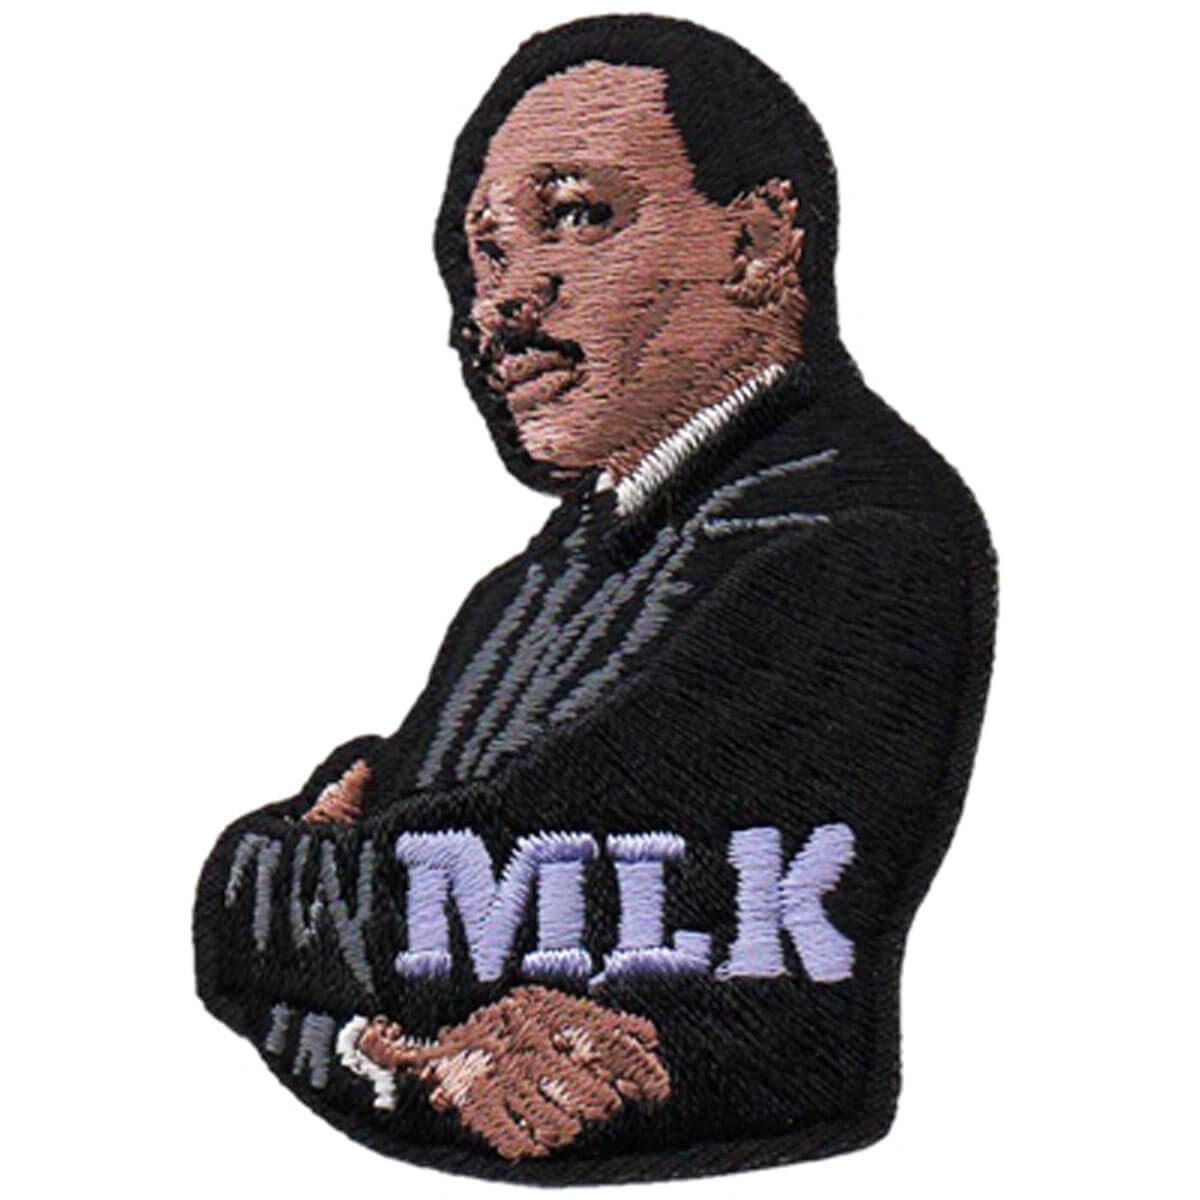 GSNI MLK